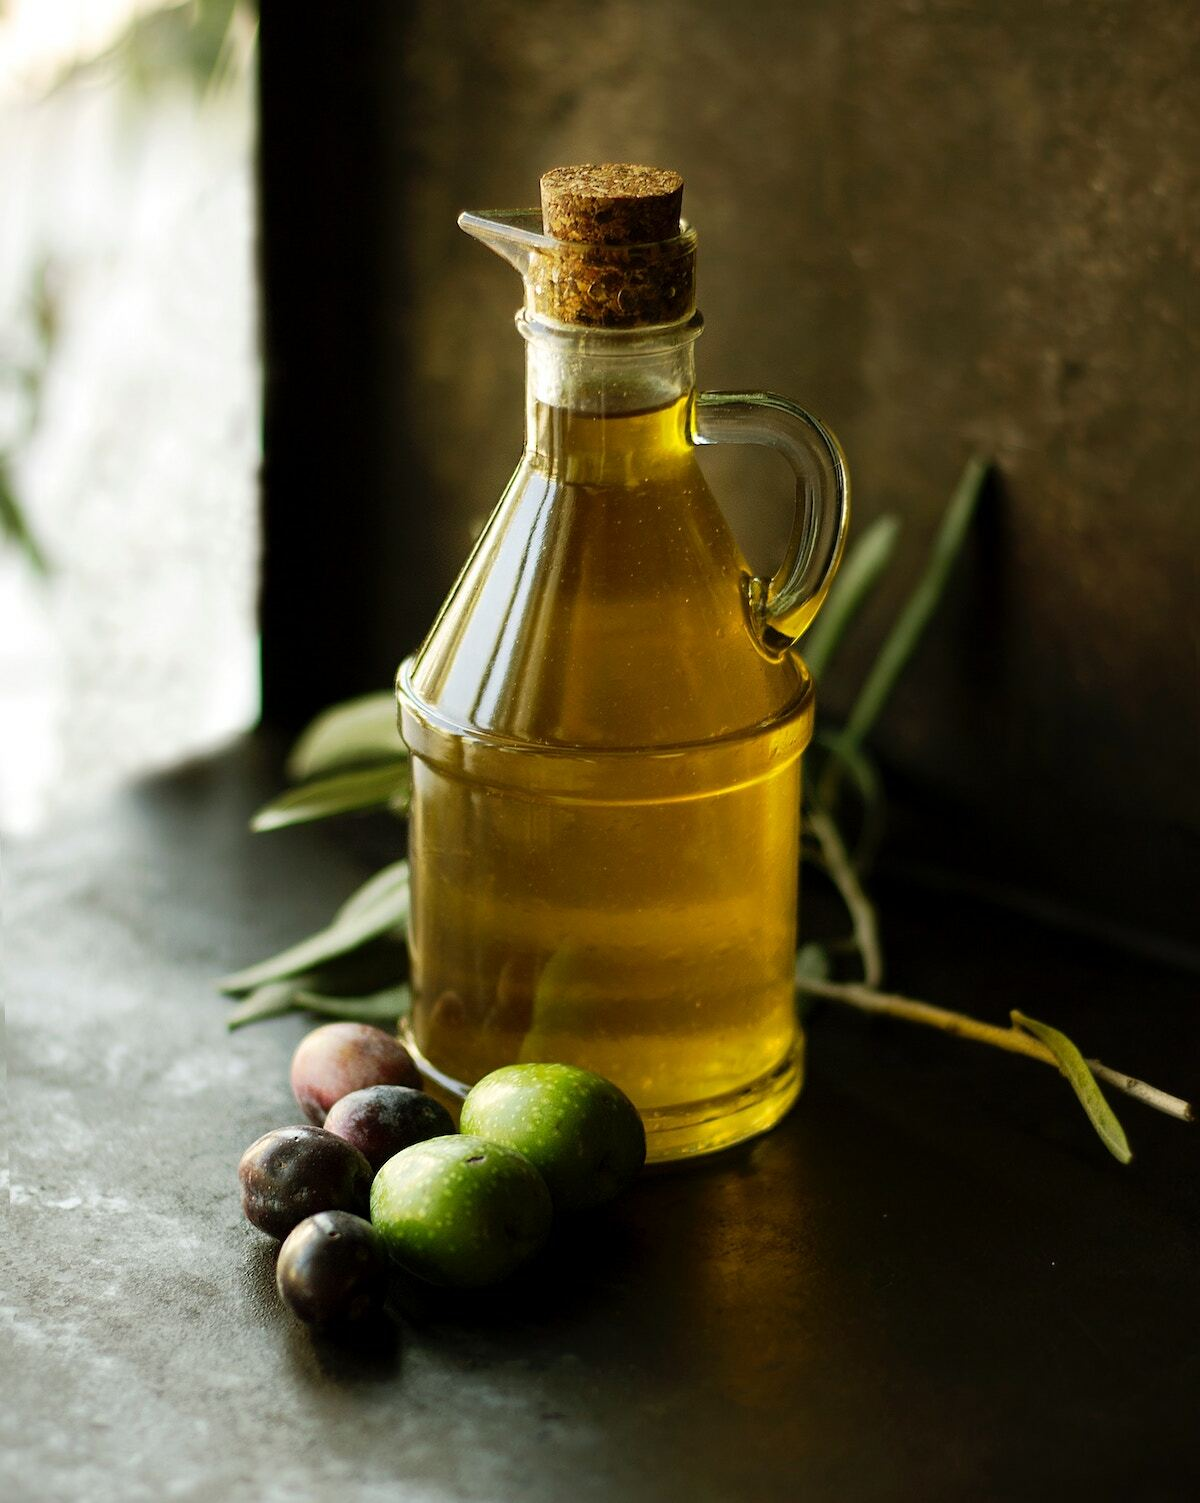 Huile d'olive © roberta-sorge unsplash